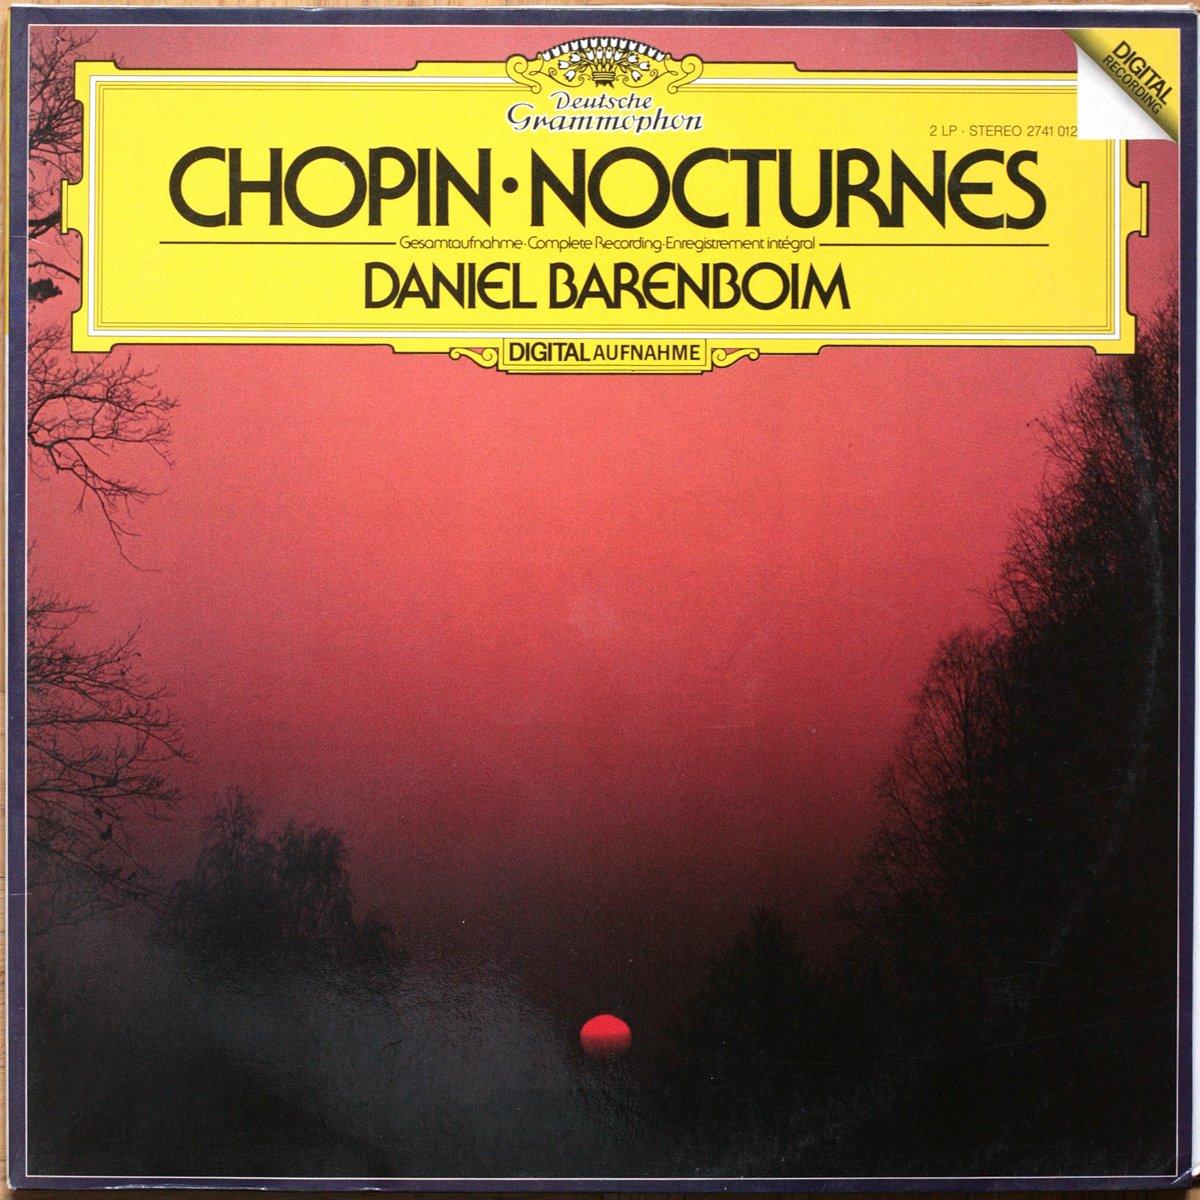 DGG 2741012 Chopin Nocturnes Barenboim